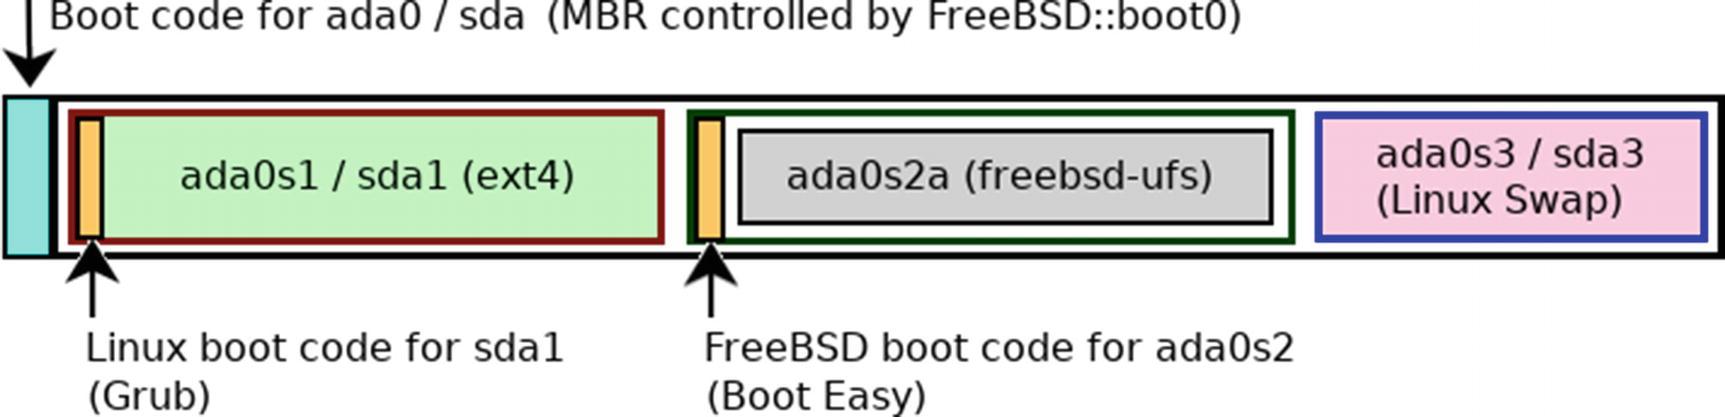 Installing and Configuring FreeBSD/Linux | SpringerLink